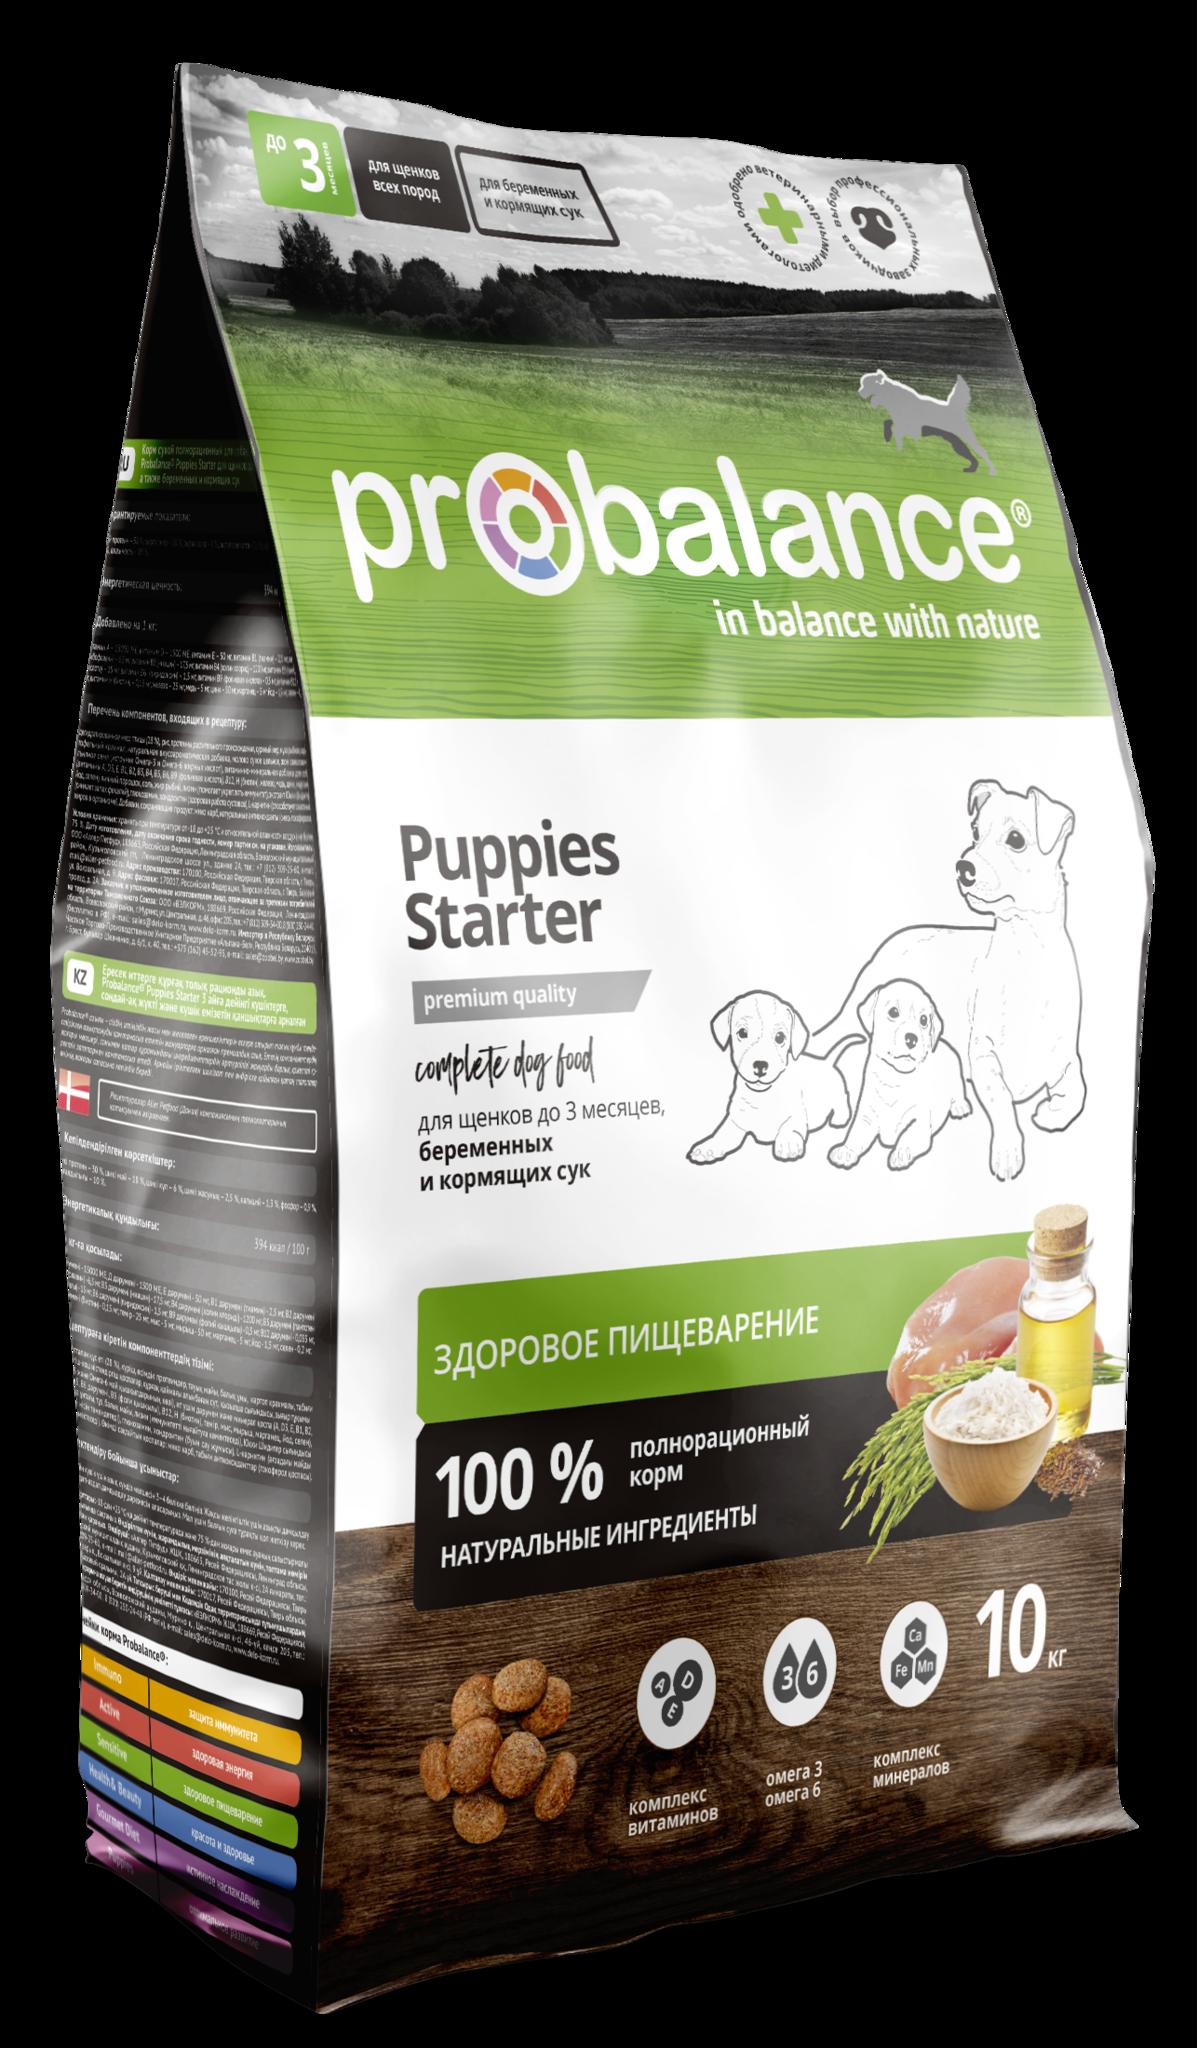 Сухой корм Корм ProBalance Starter для щенков менее 3-х месяцев и кормящих сук 10_PB_Starter.png